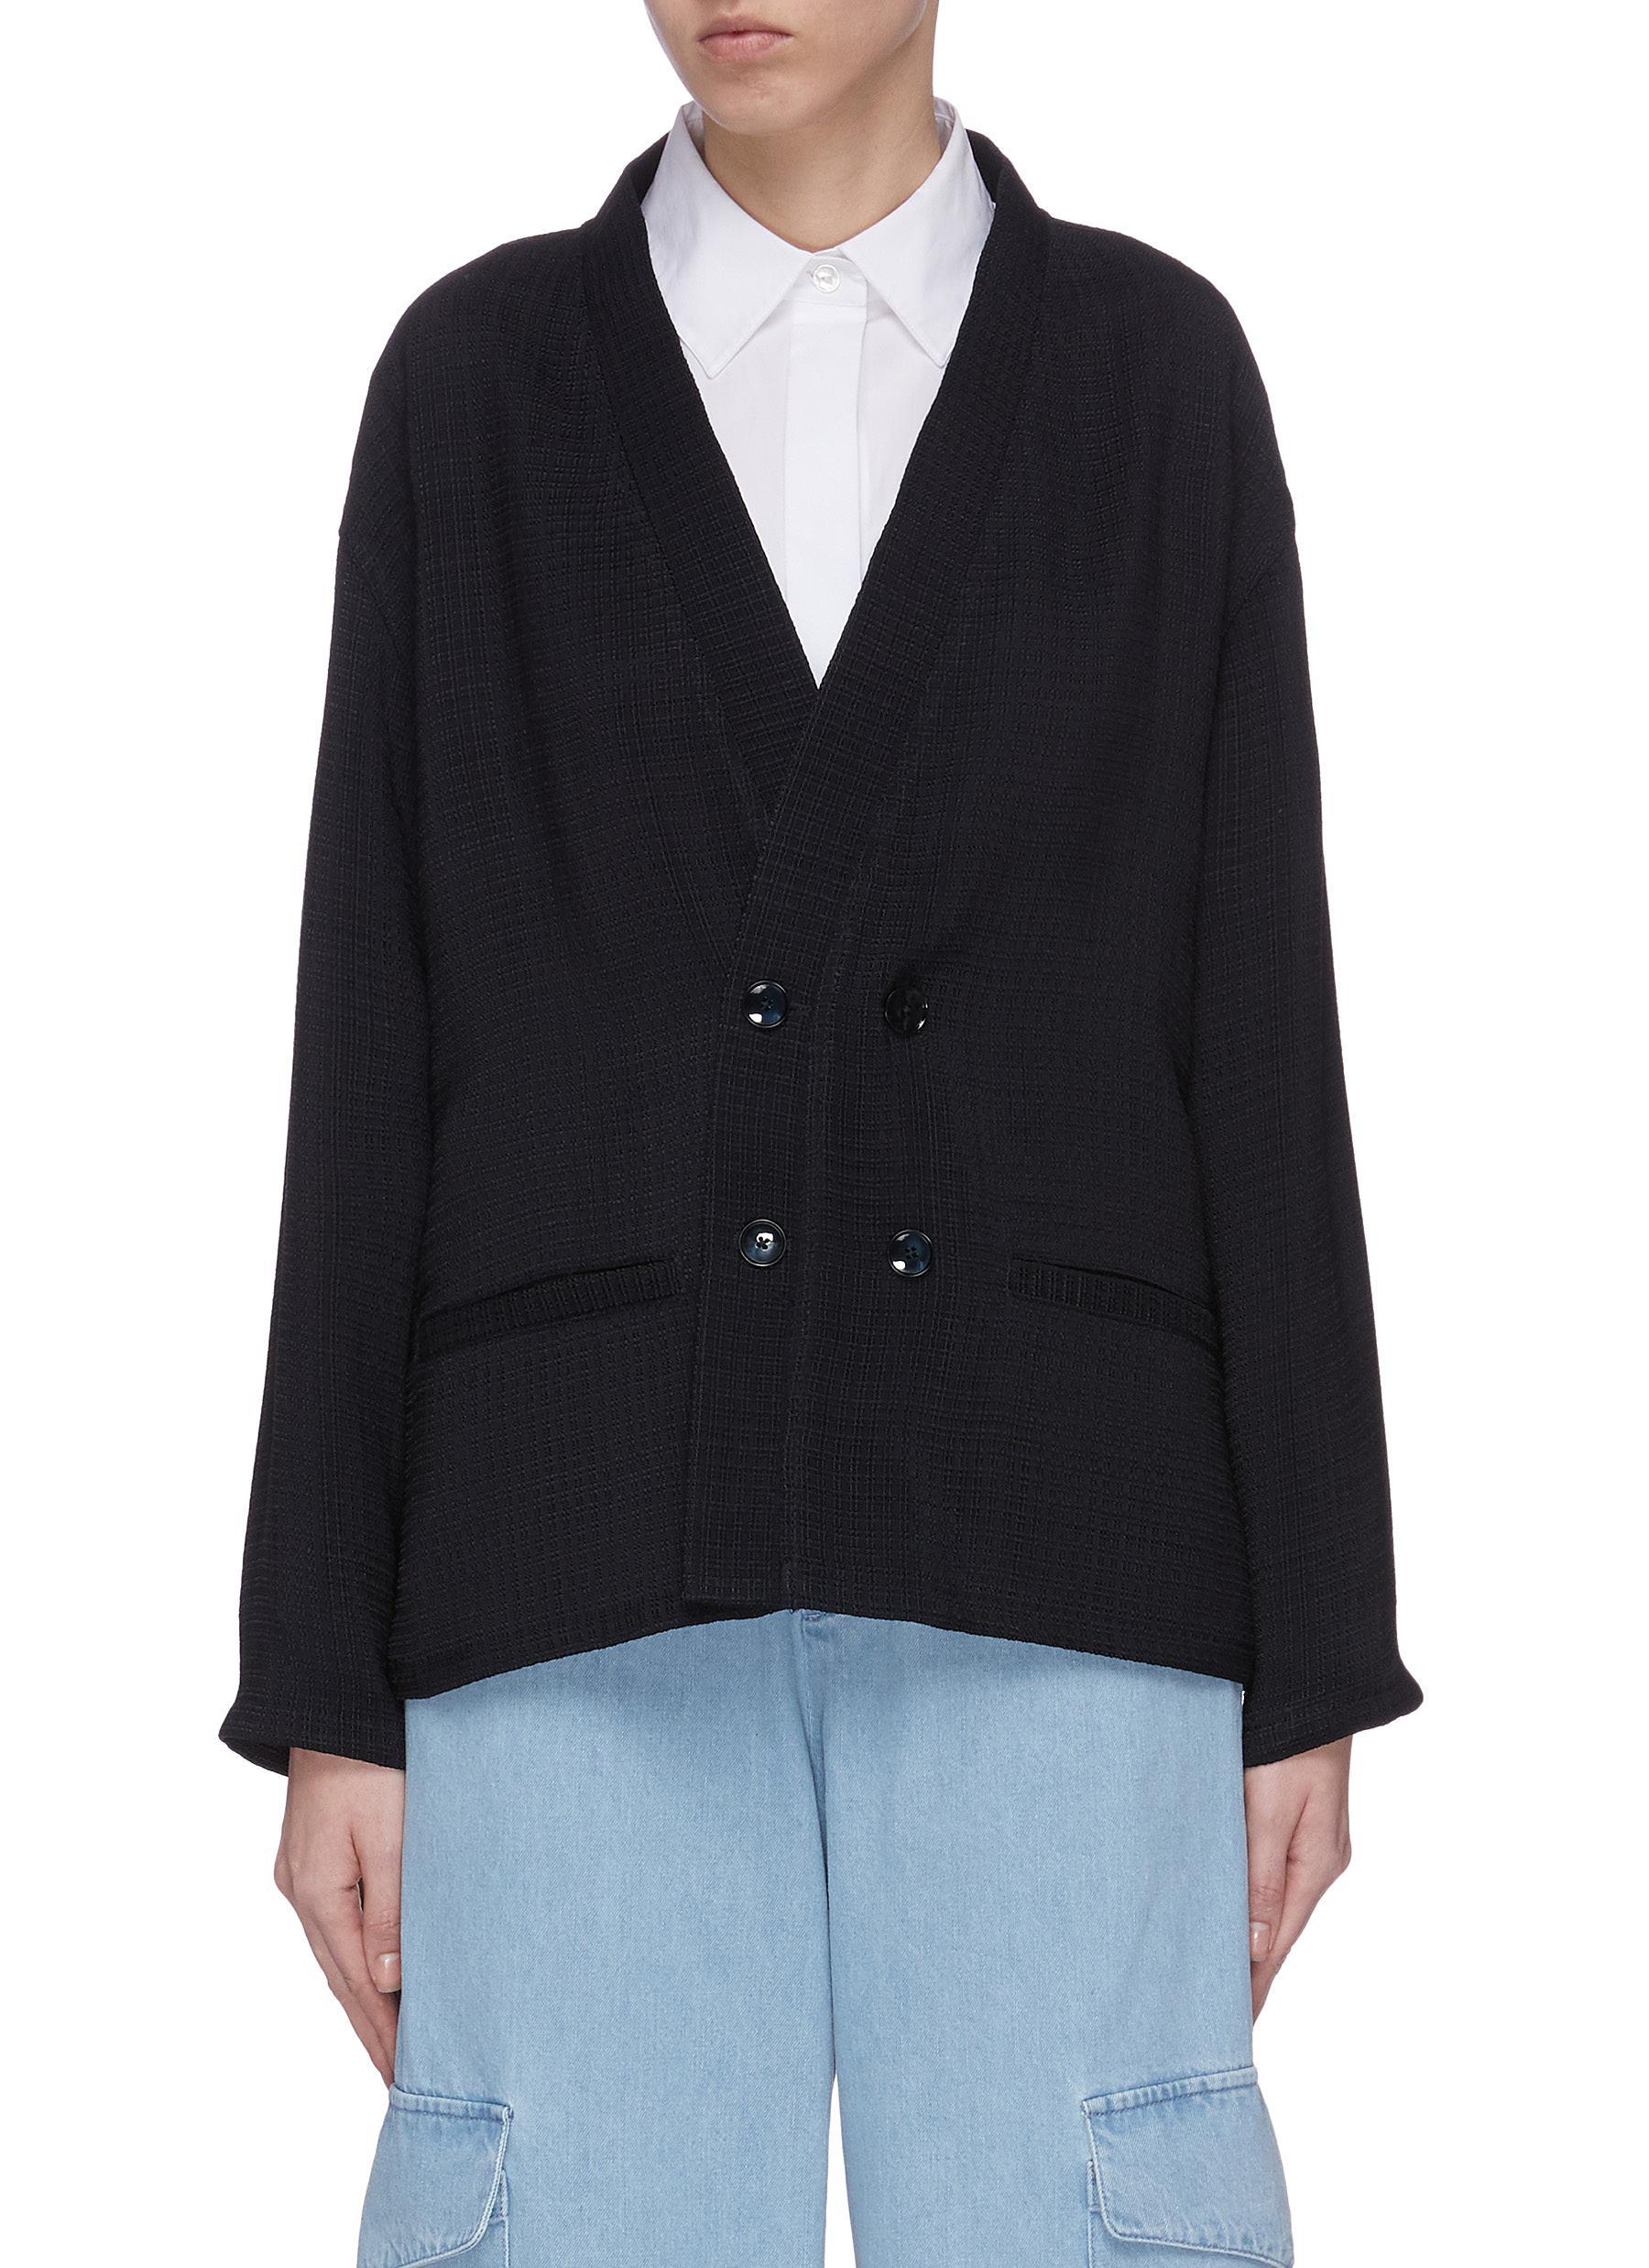 Buy Barena Knitwear 'Kimo' double breasted cardigan